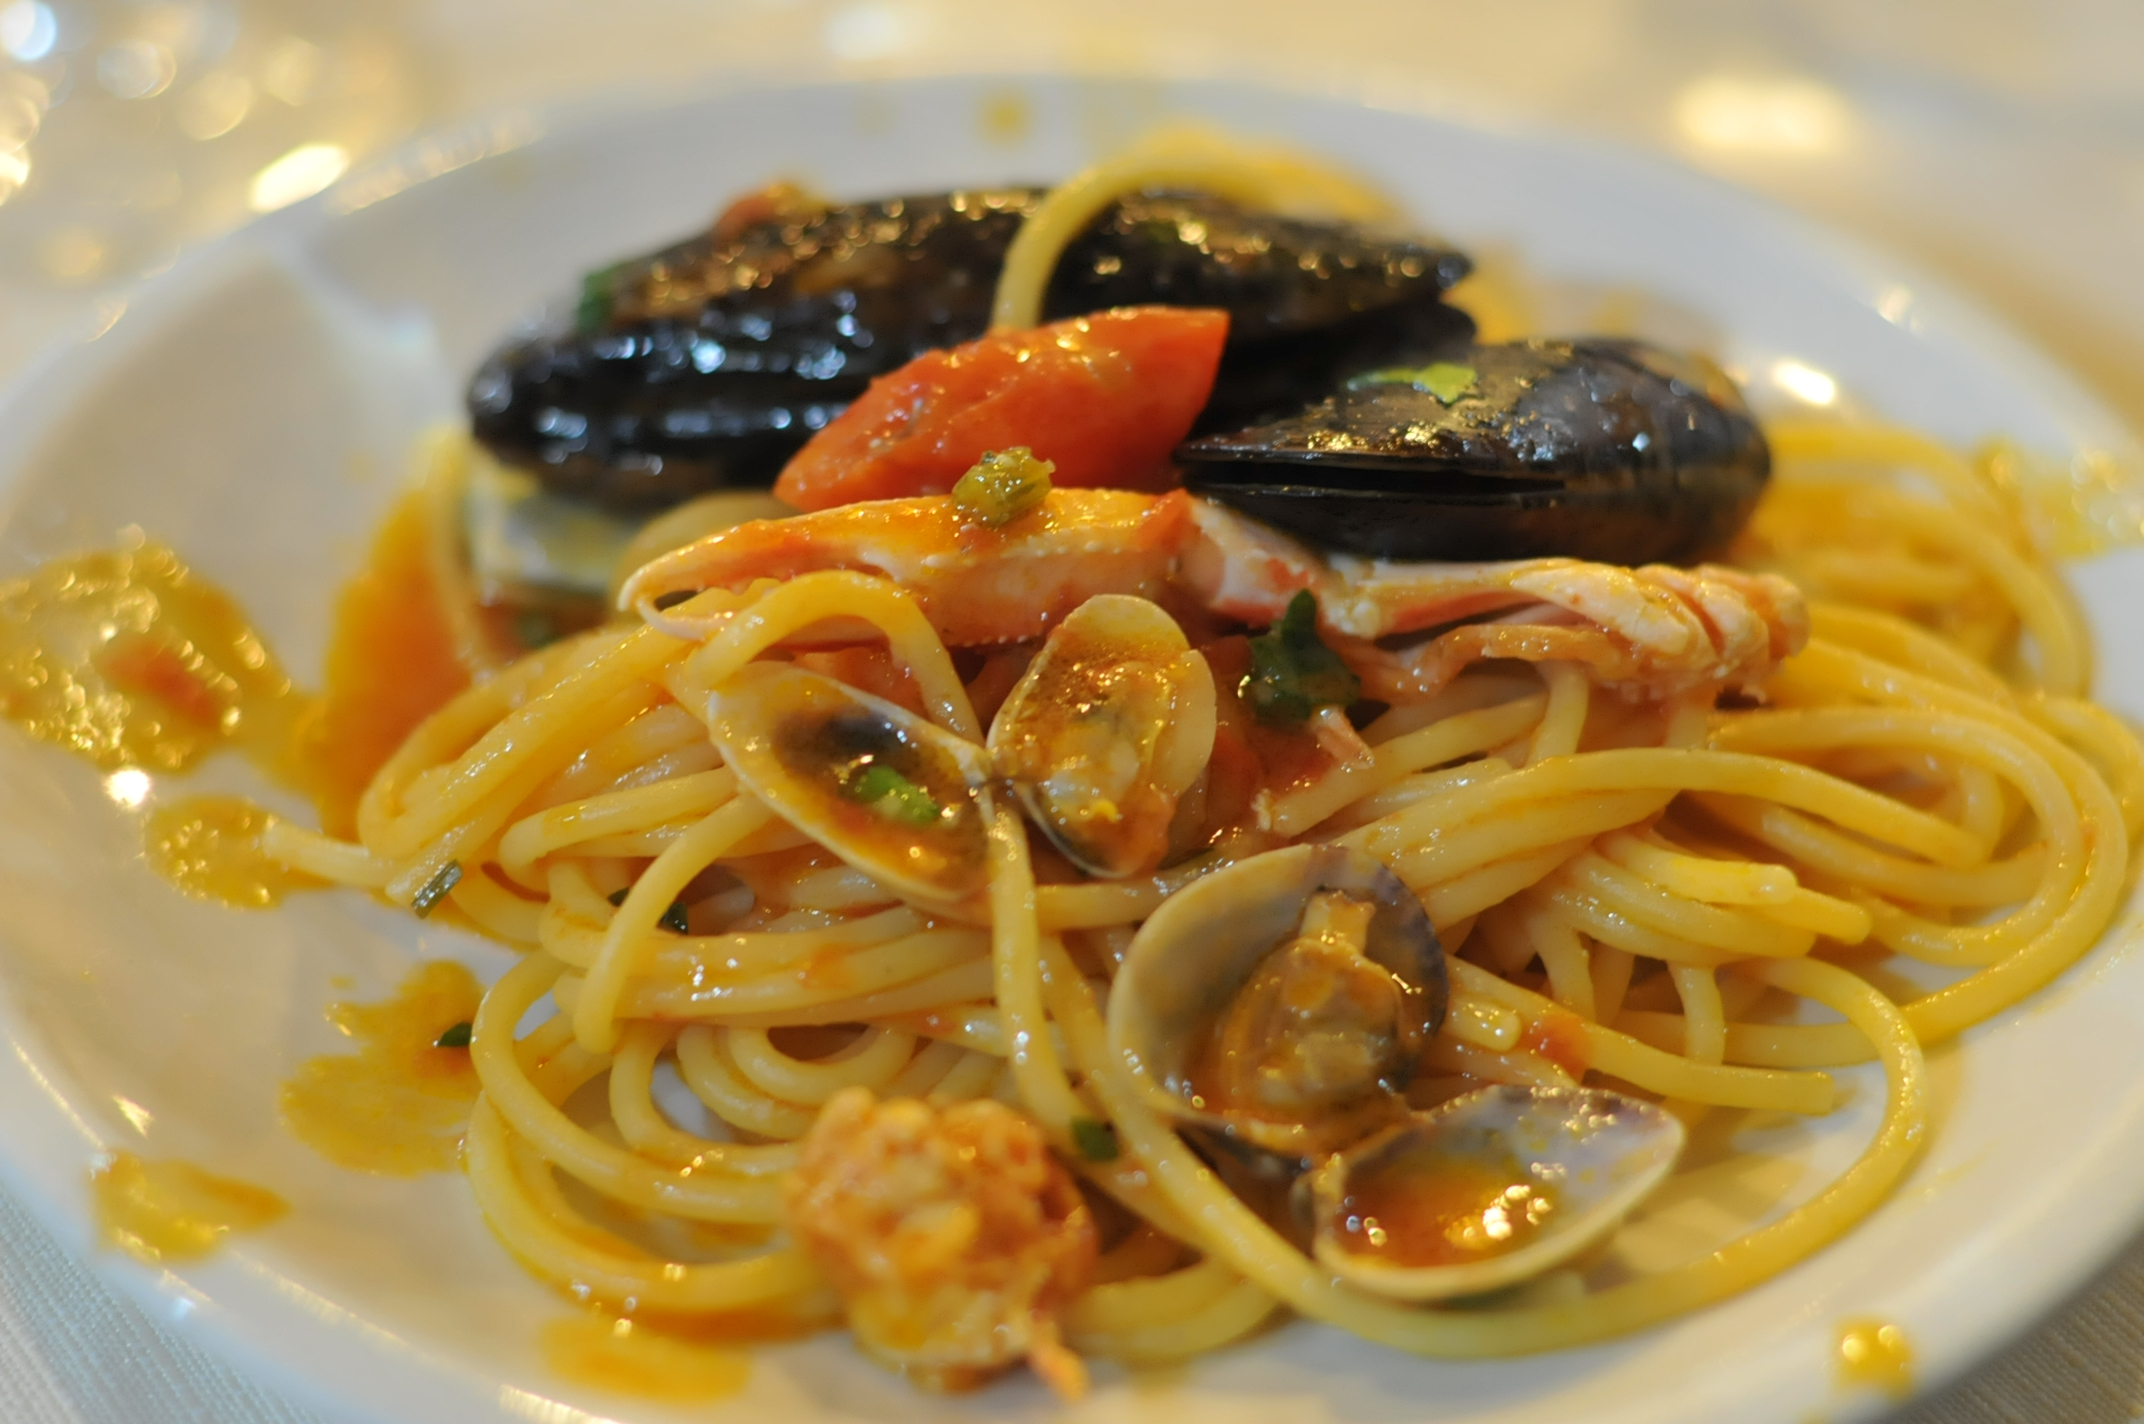 Papetto Ristorante – Eating like a local in Rome